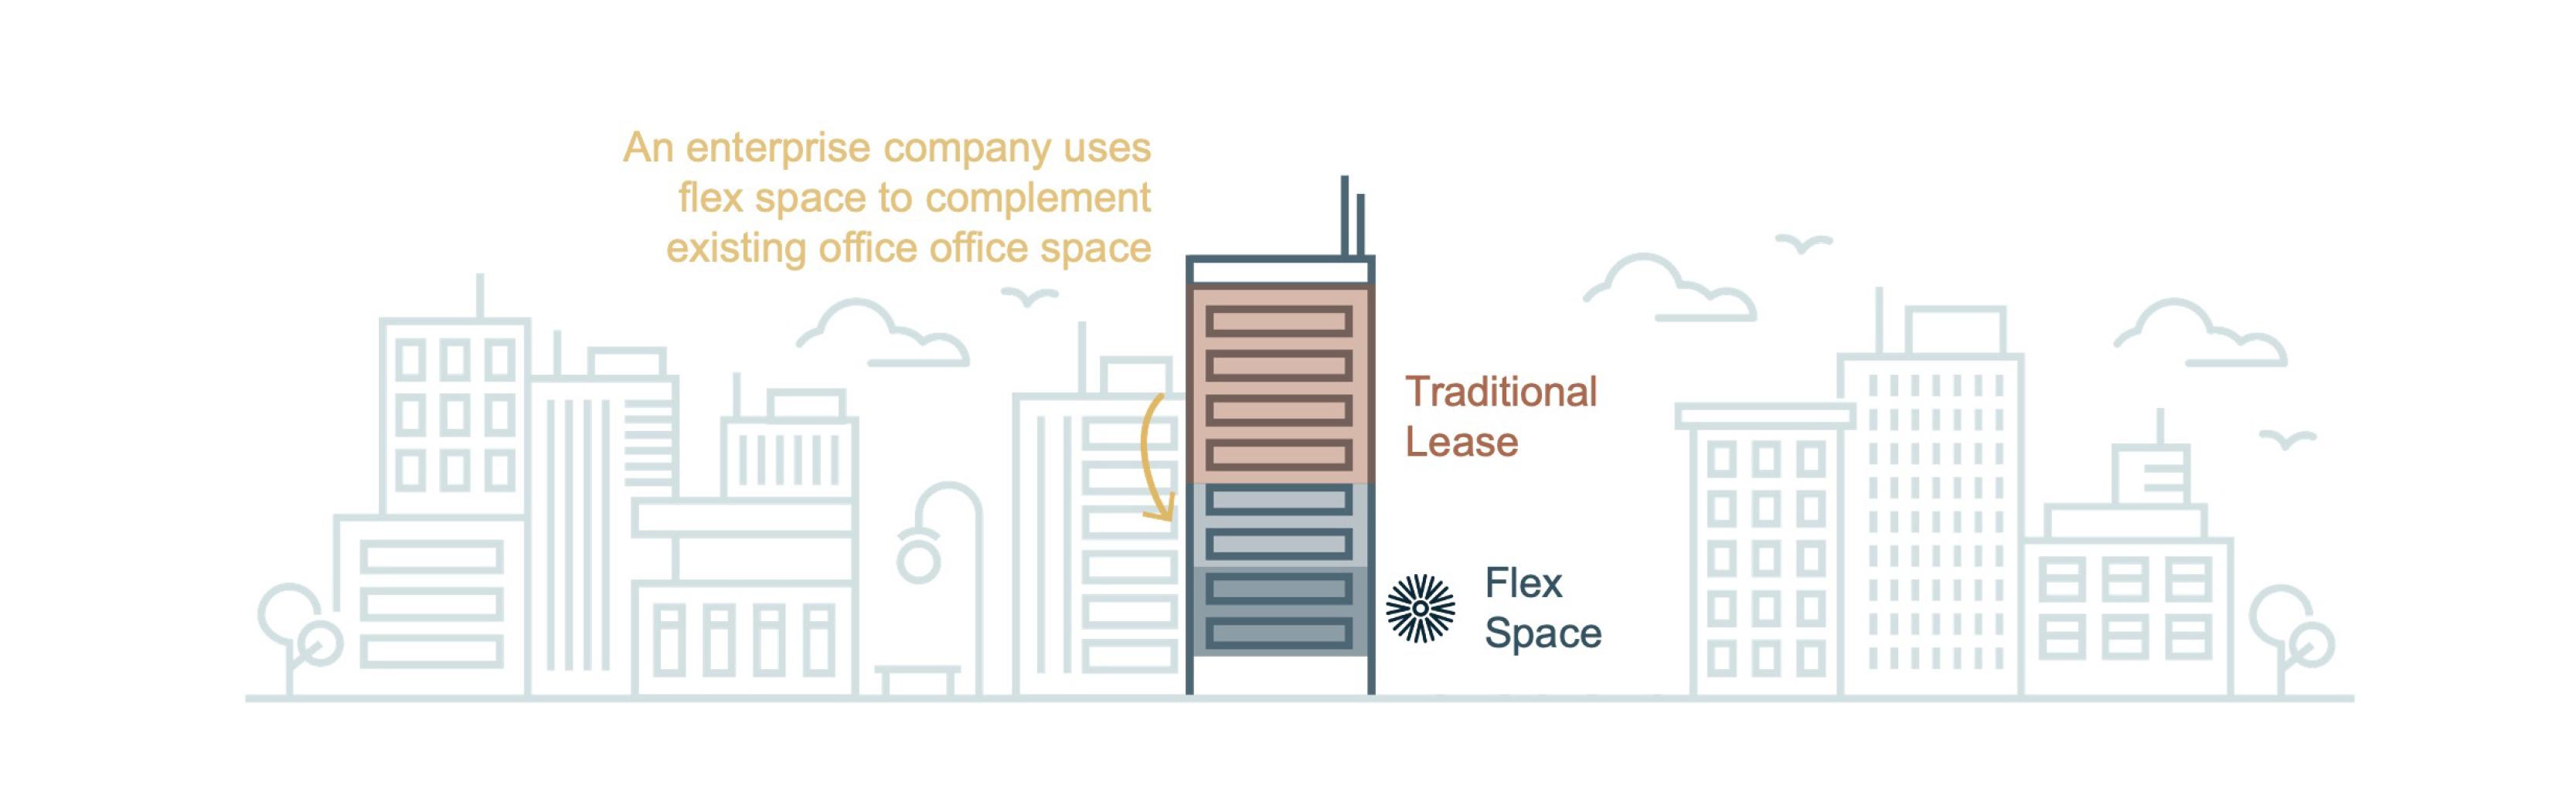 how-enterprise-companies-use-flex-space-peak-occupancy